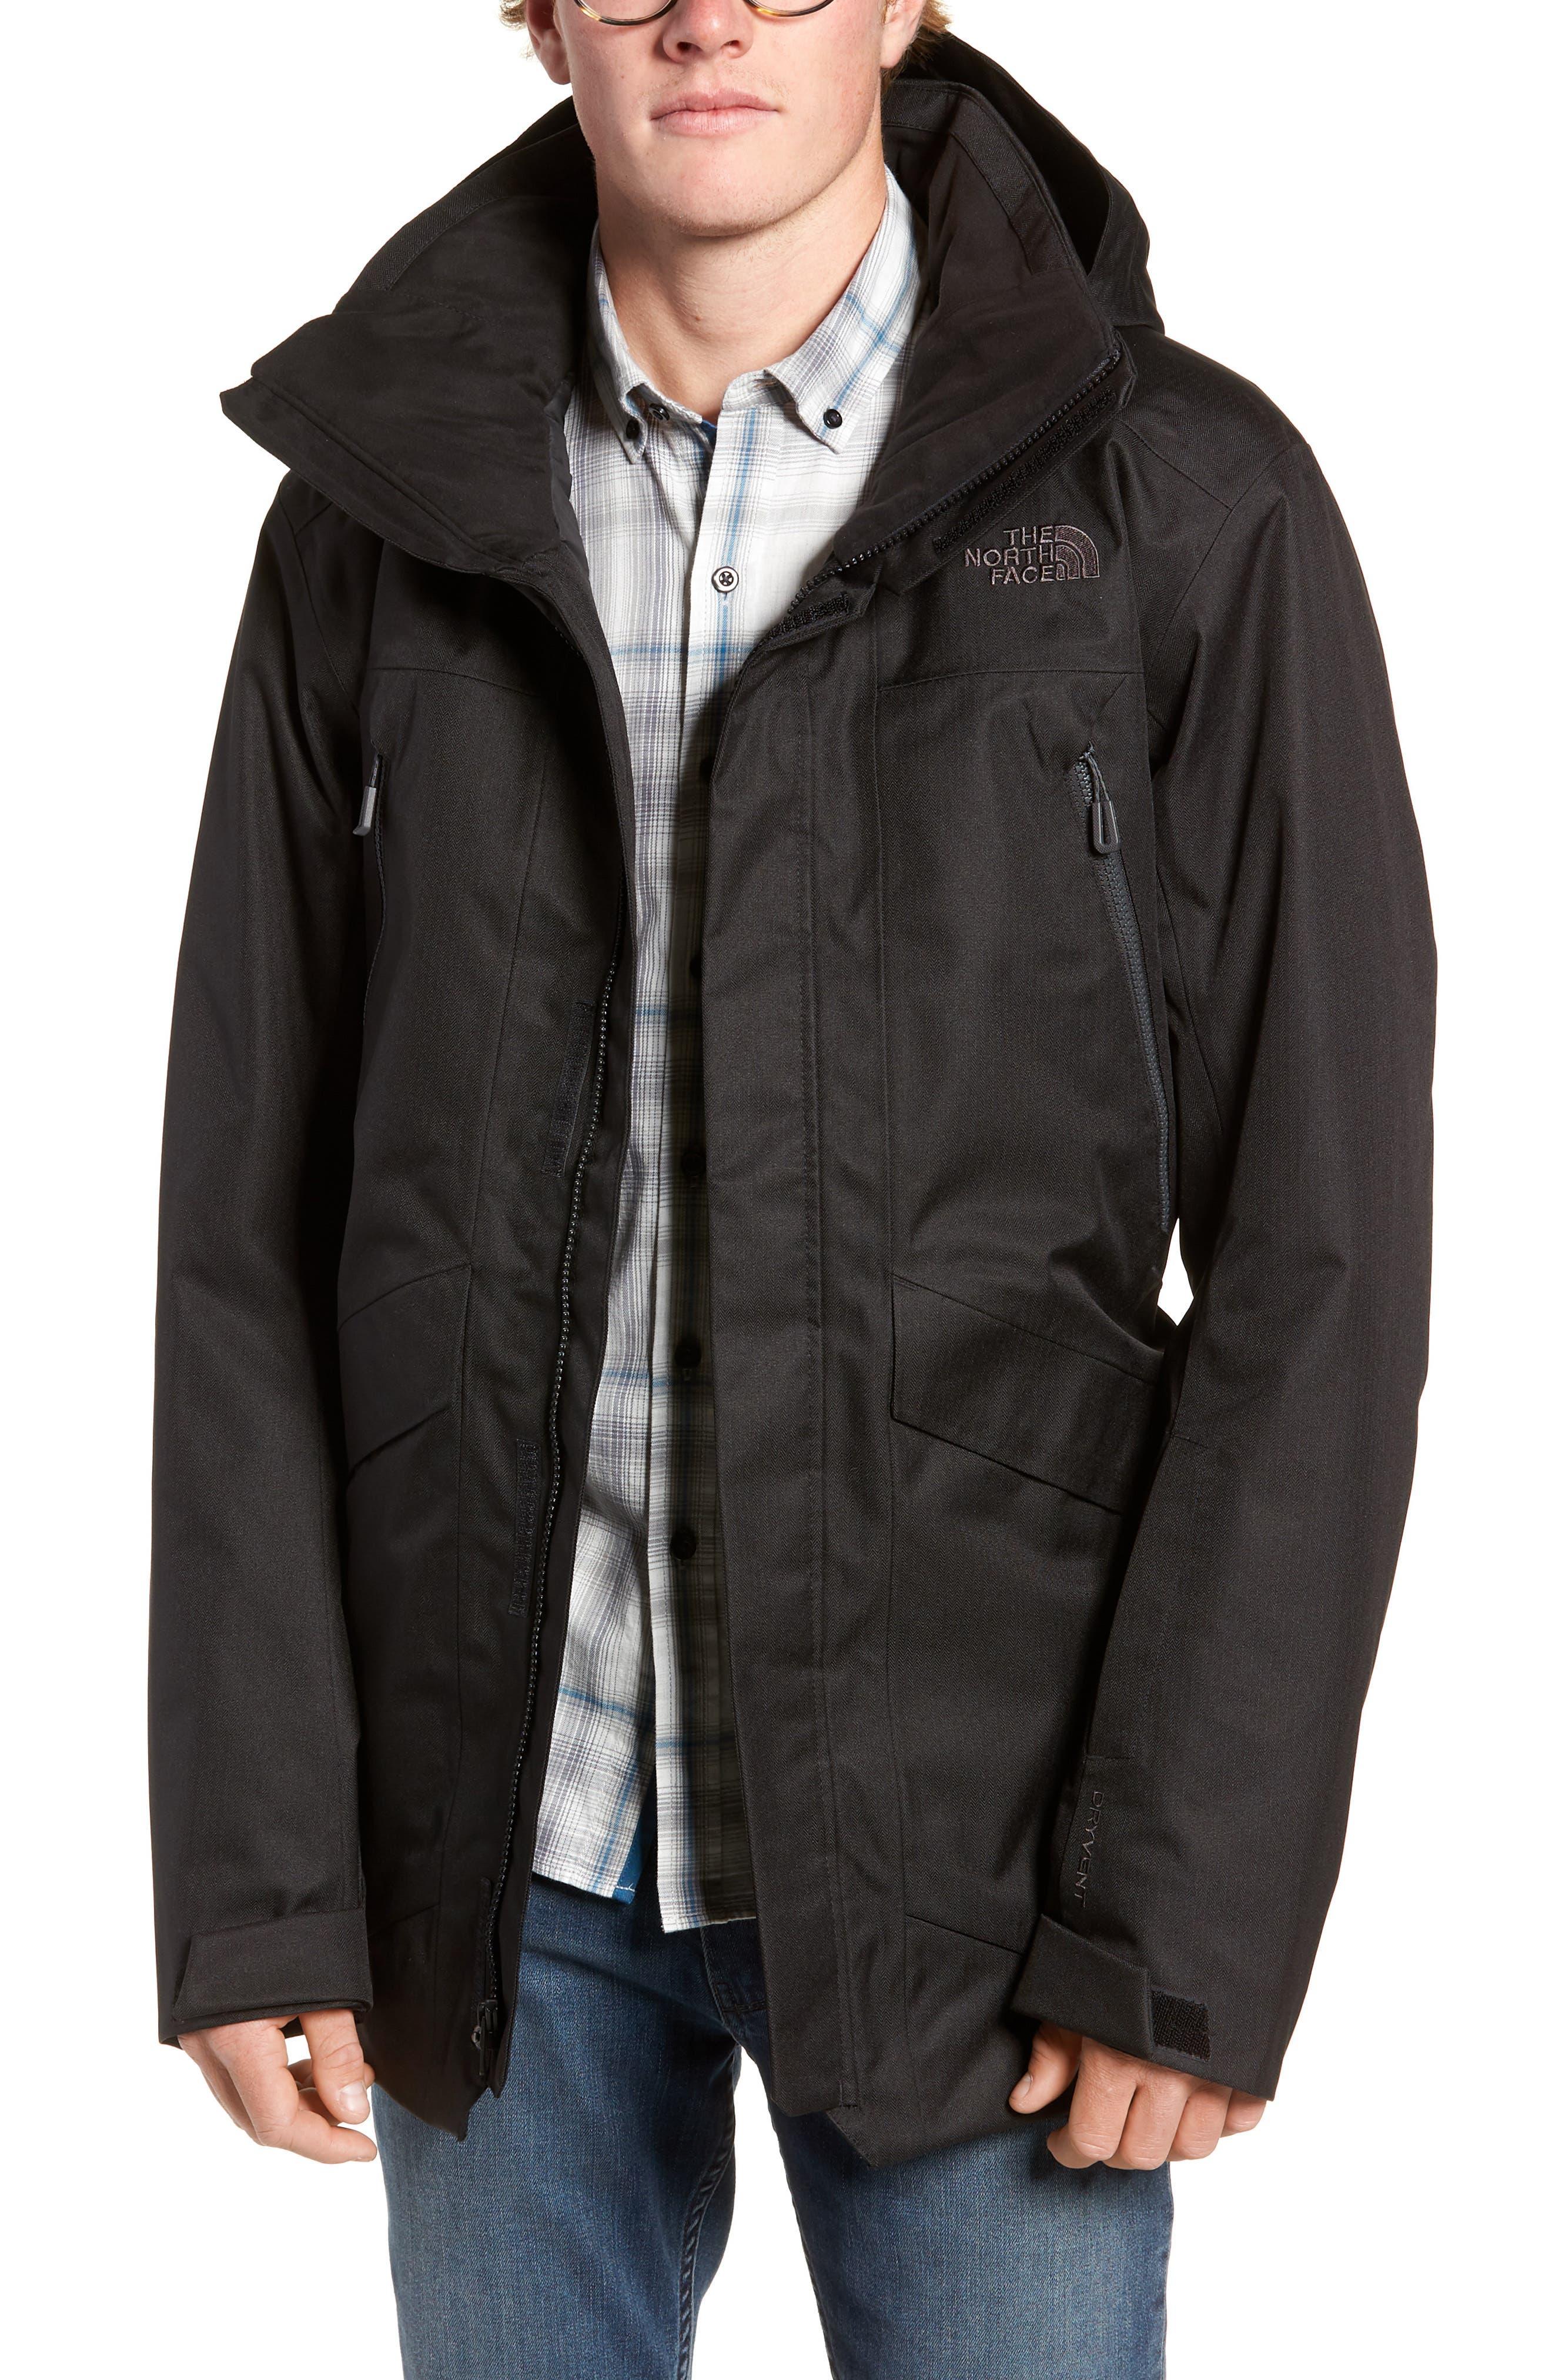 Gatekeeper Waterproof Jacket,                             Main thumbnail 1, color,                             TNF BLACK/TNF BLACK